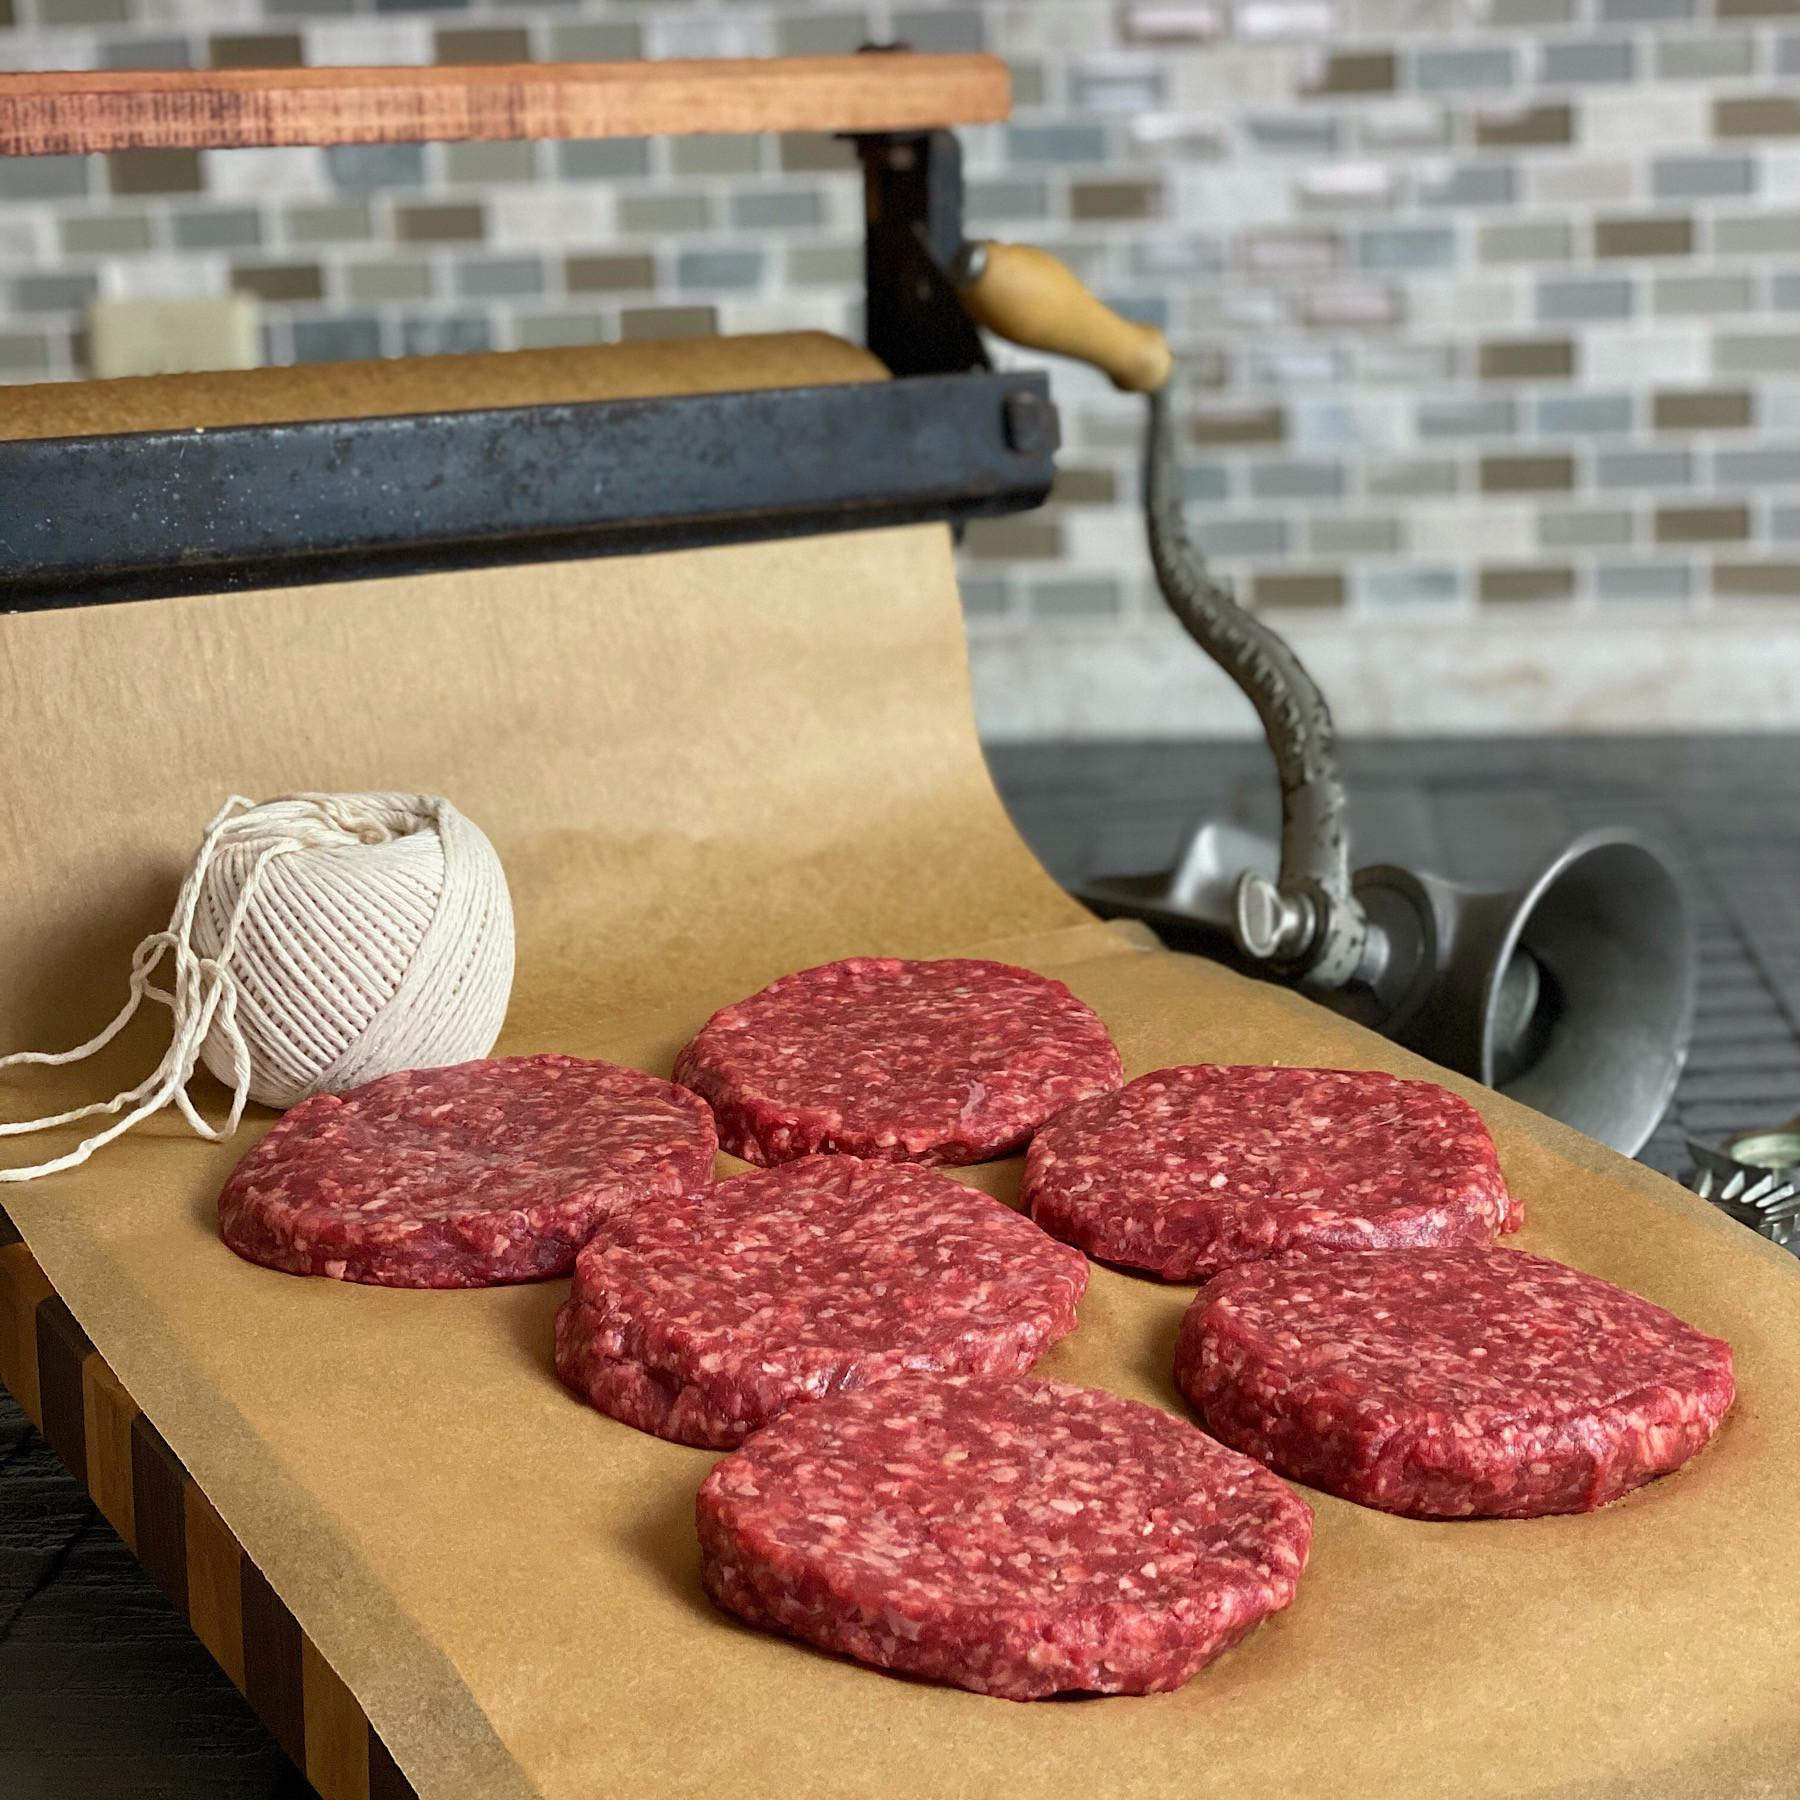 STR Premium 1/3 lb Ground Beef Patties